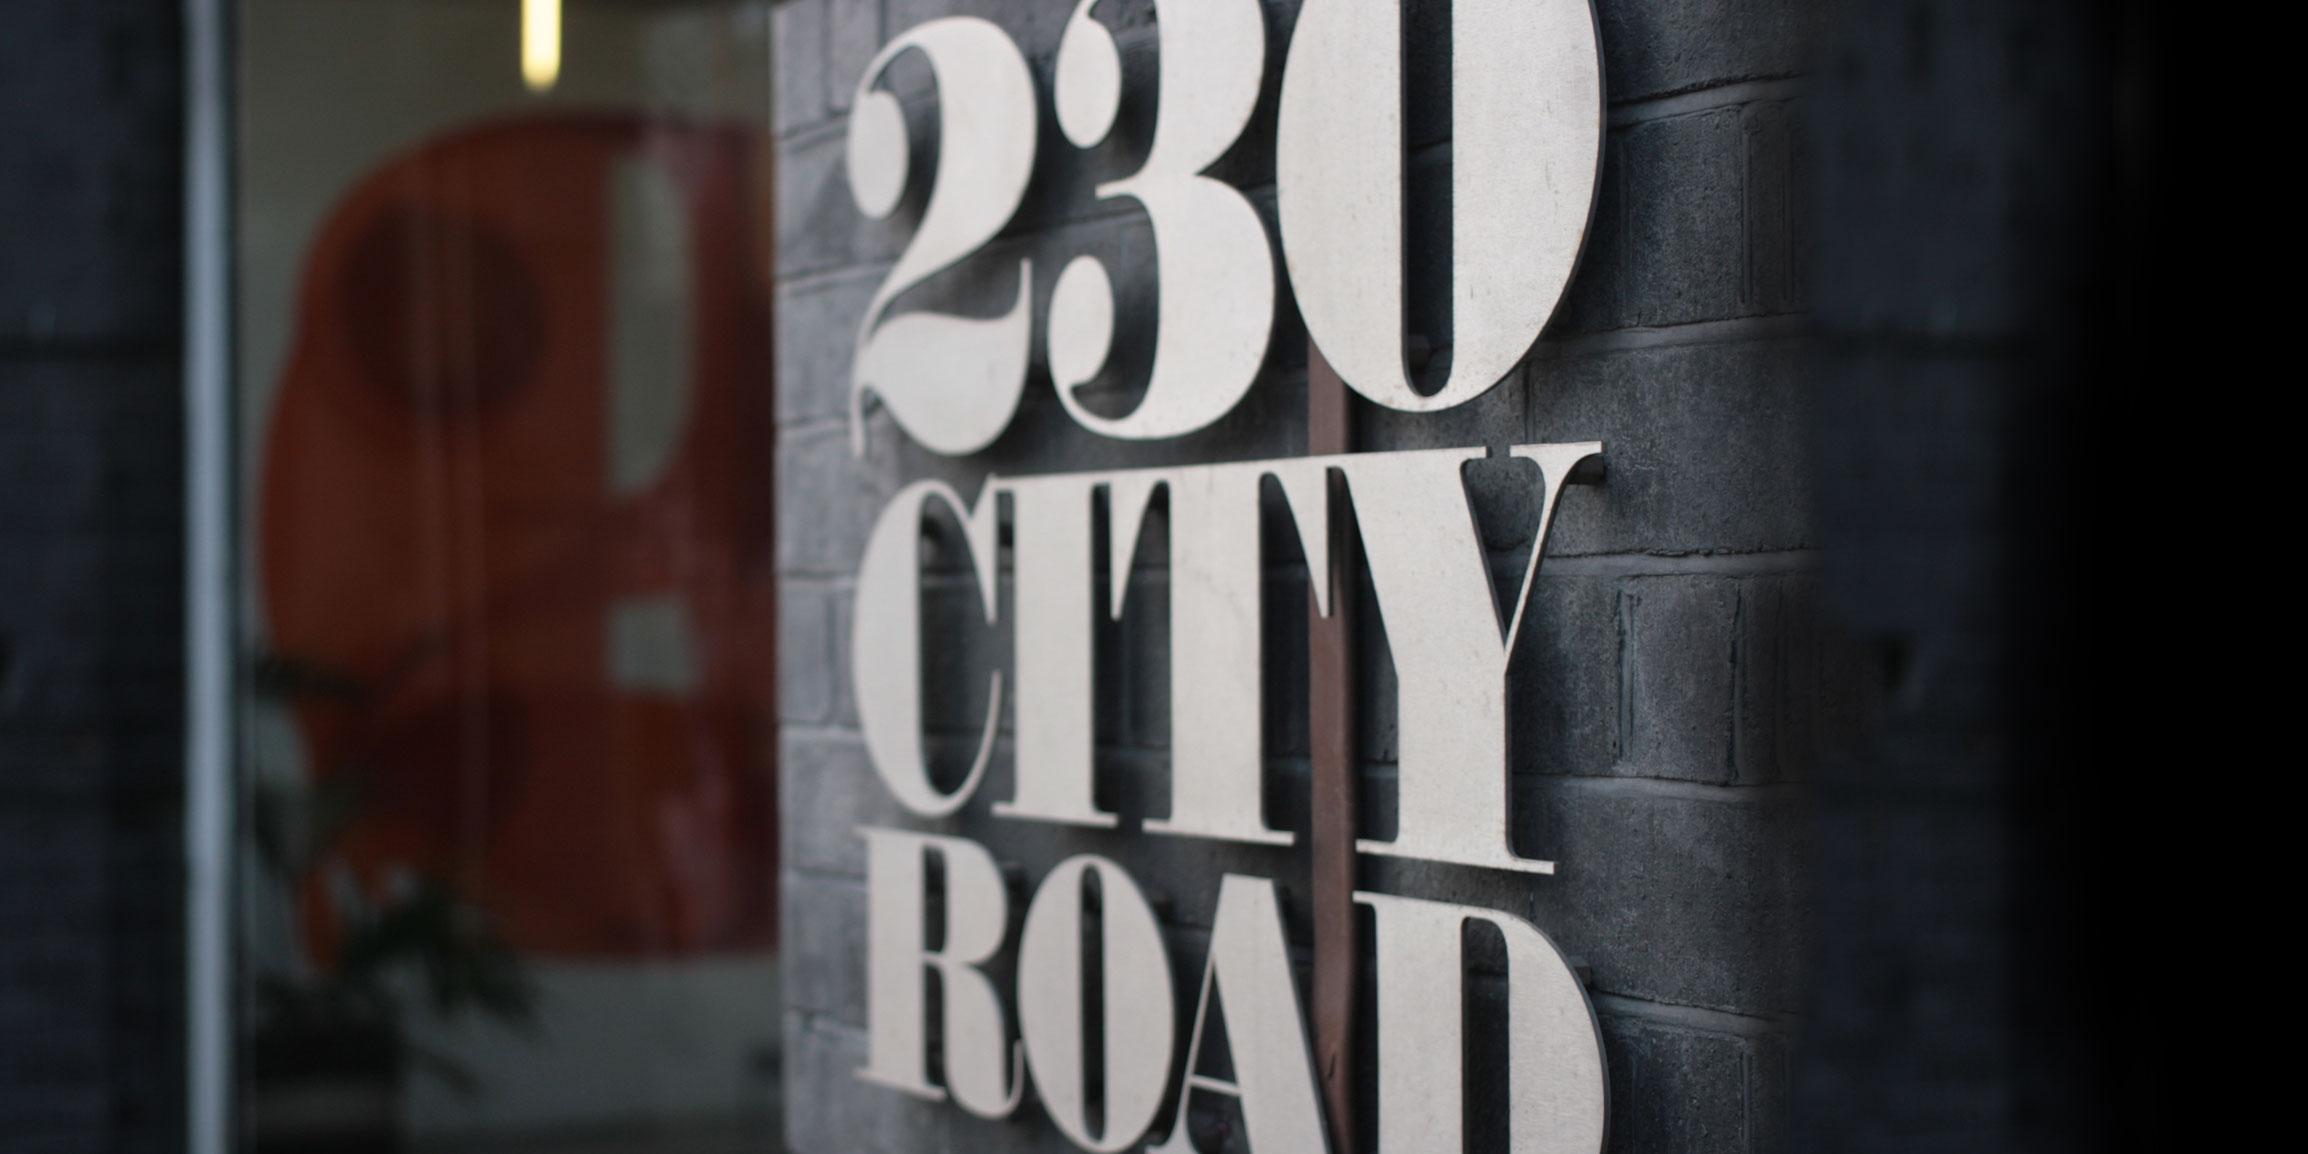 230_city_road_1